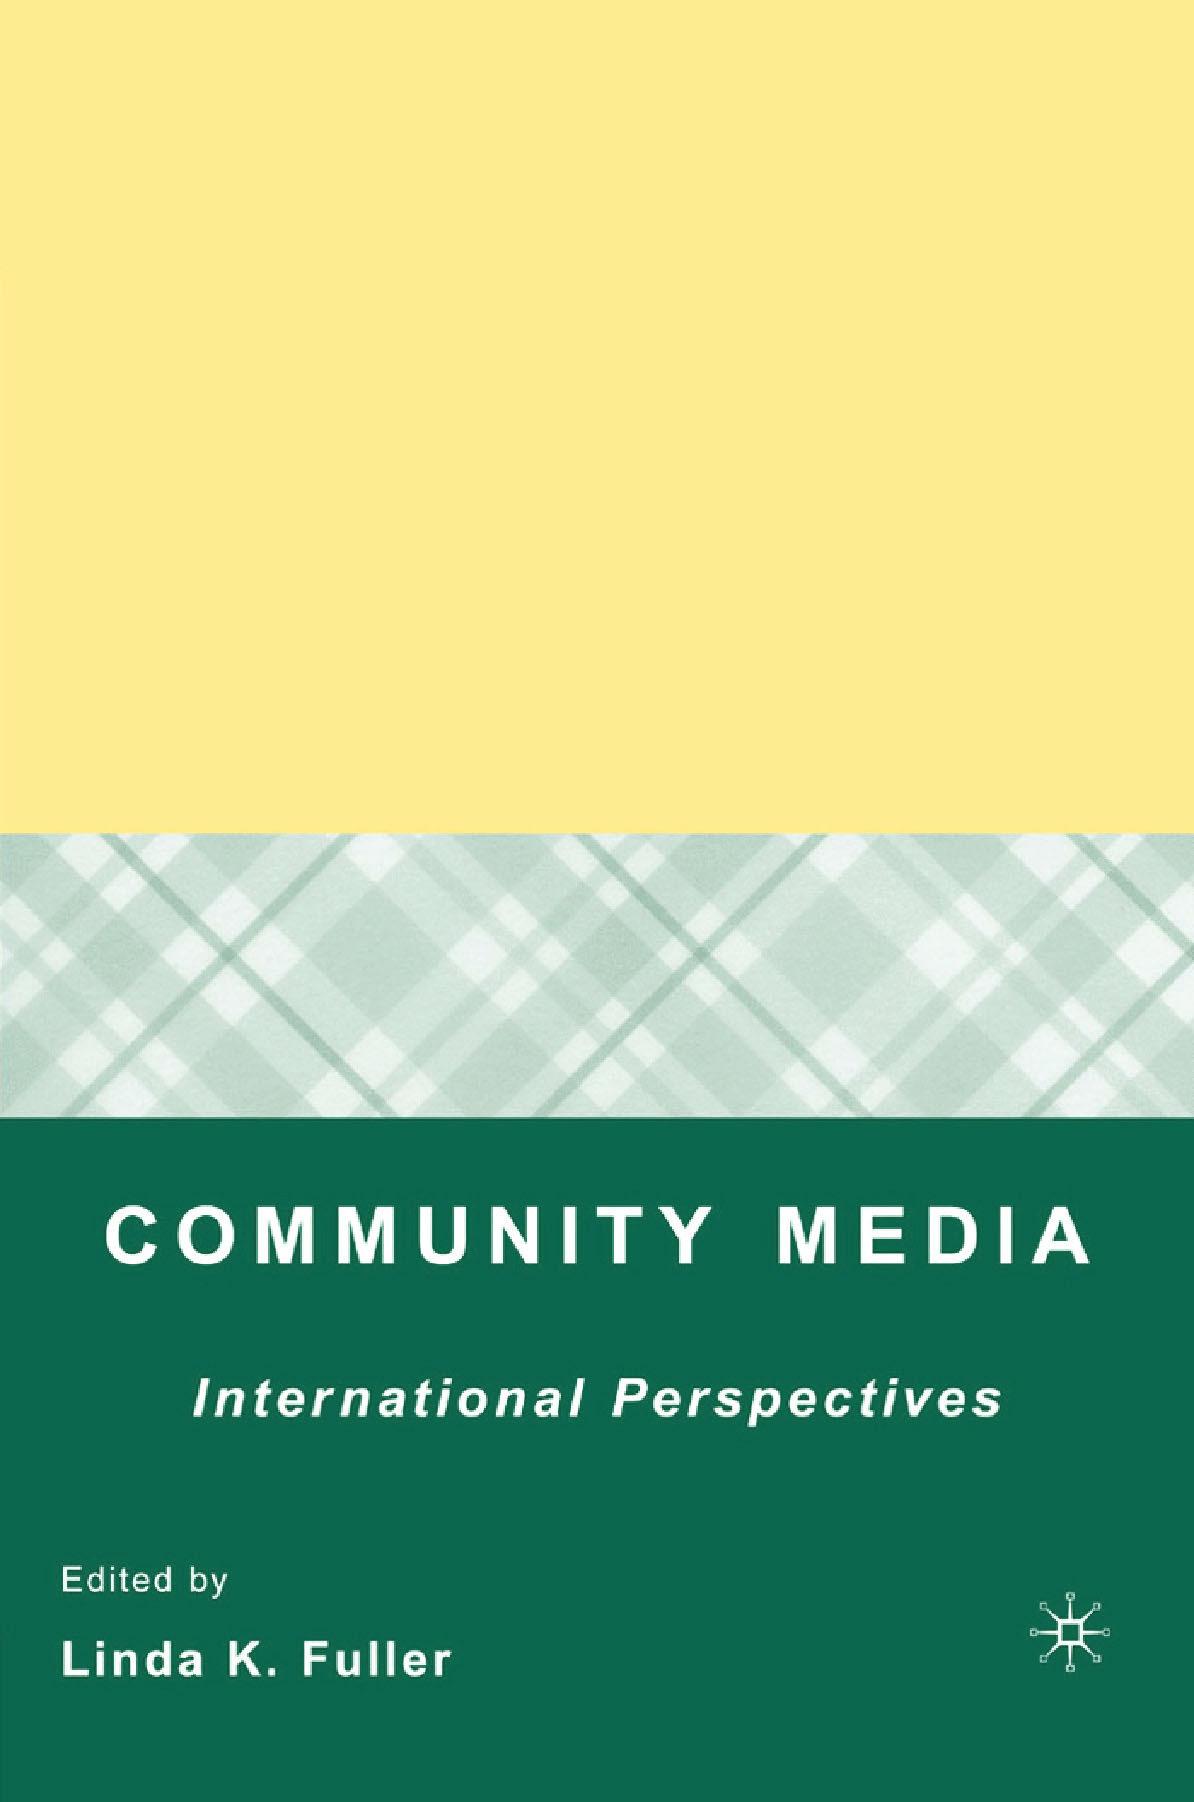 Fuller, Linda K. - Community Media, ebook